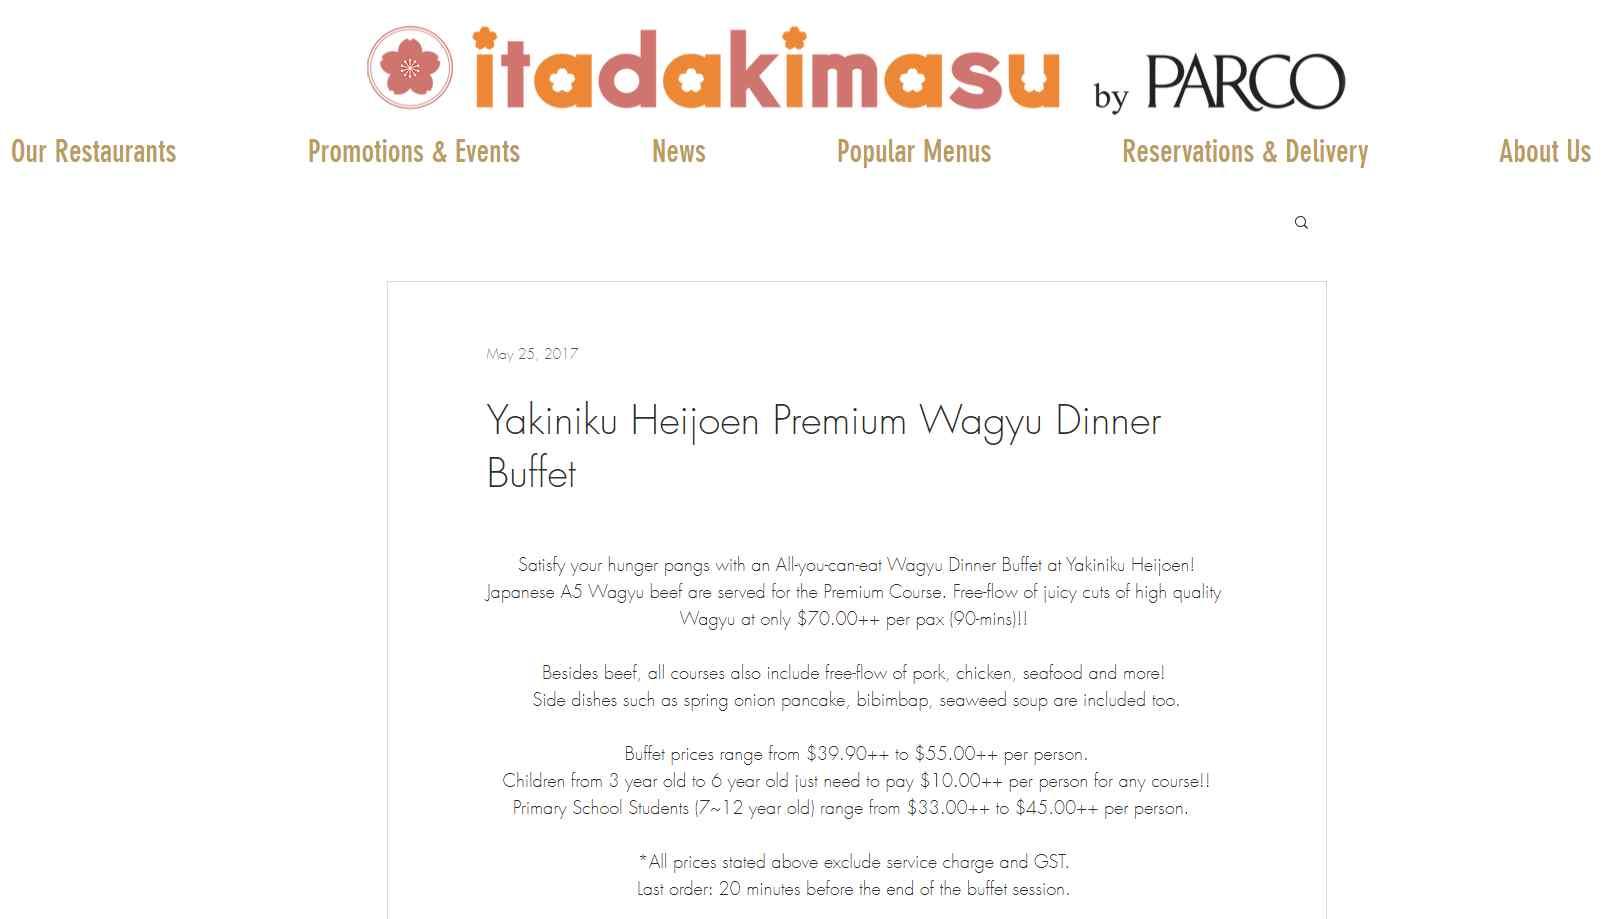 parco itadakimasu Top Japanese Buffets in Singapore